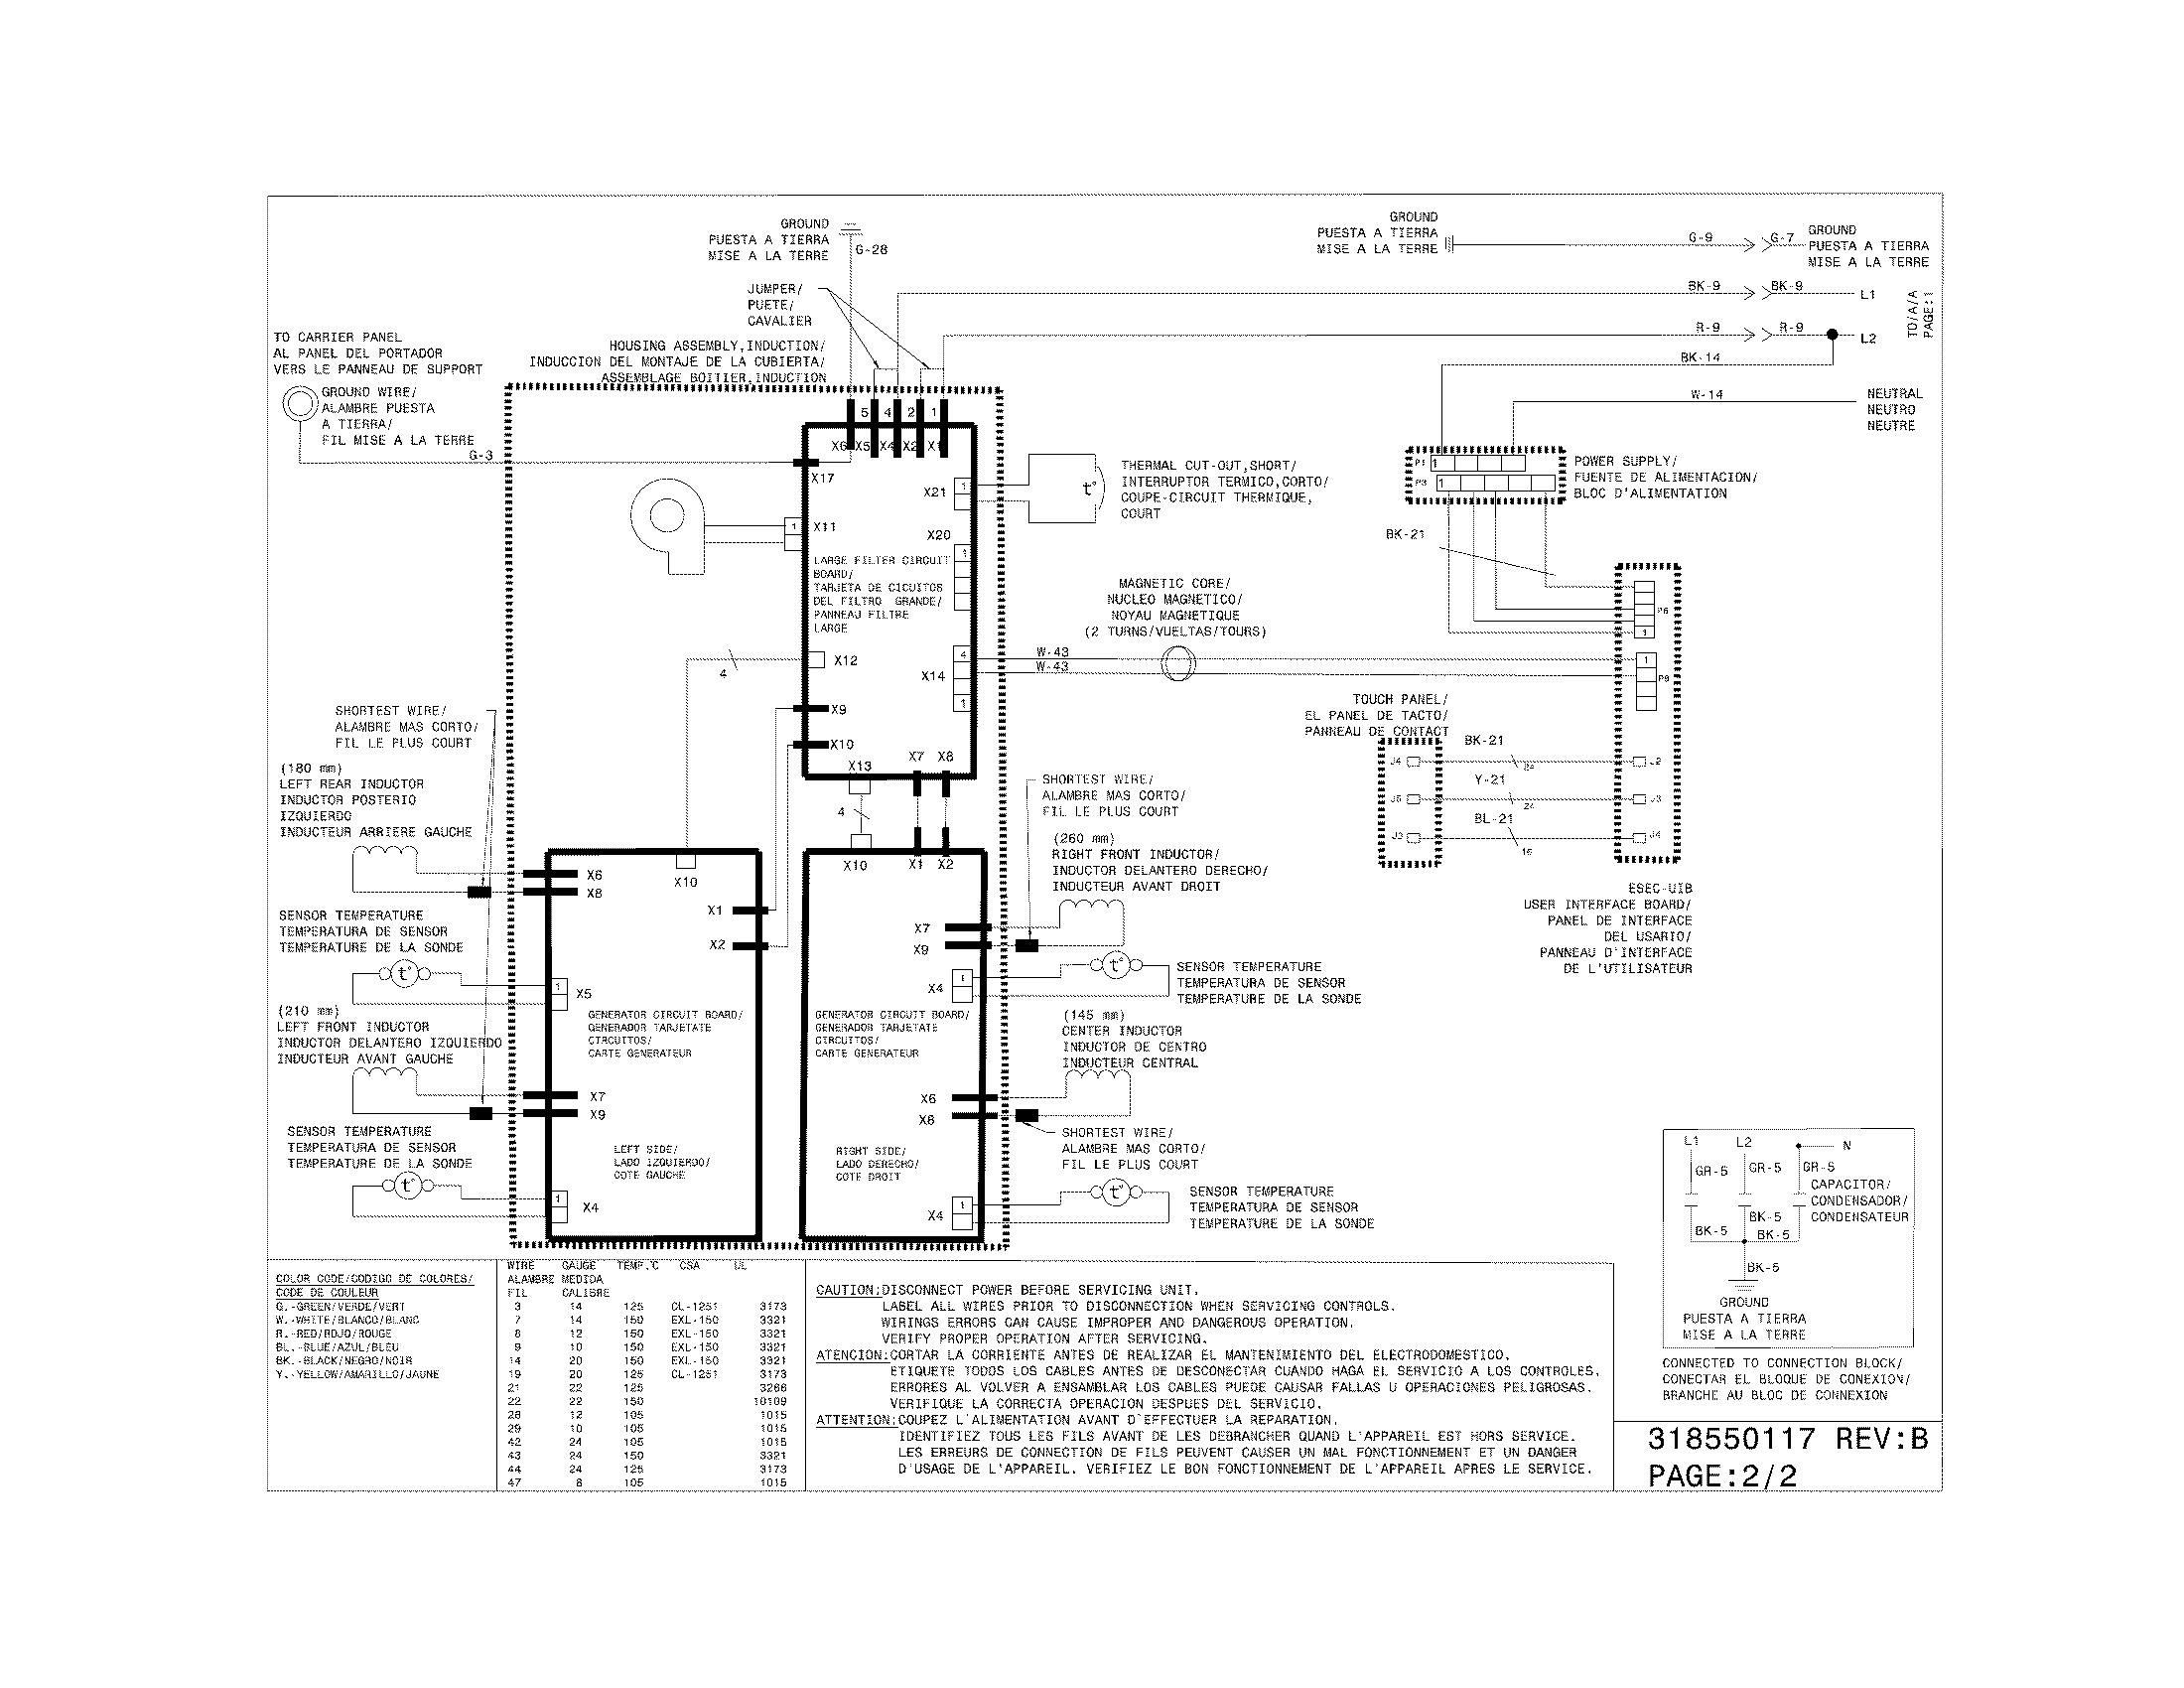 1990 cadillac fleetwood fuse box diagram 1985 cadillac fleetwood fuse box